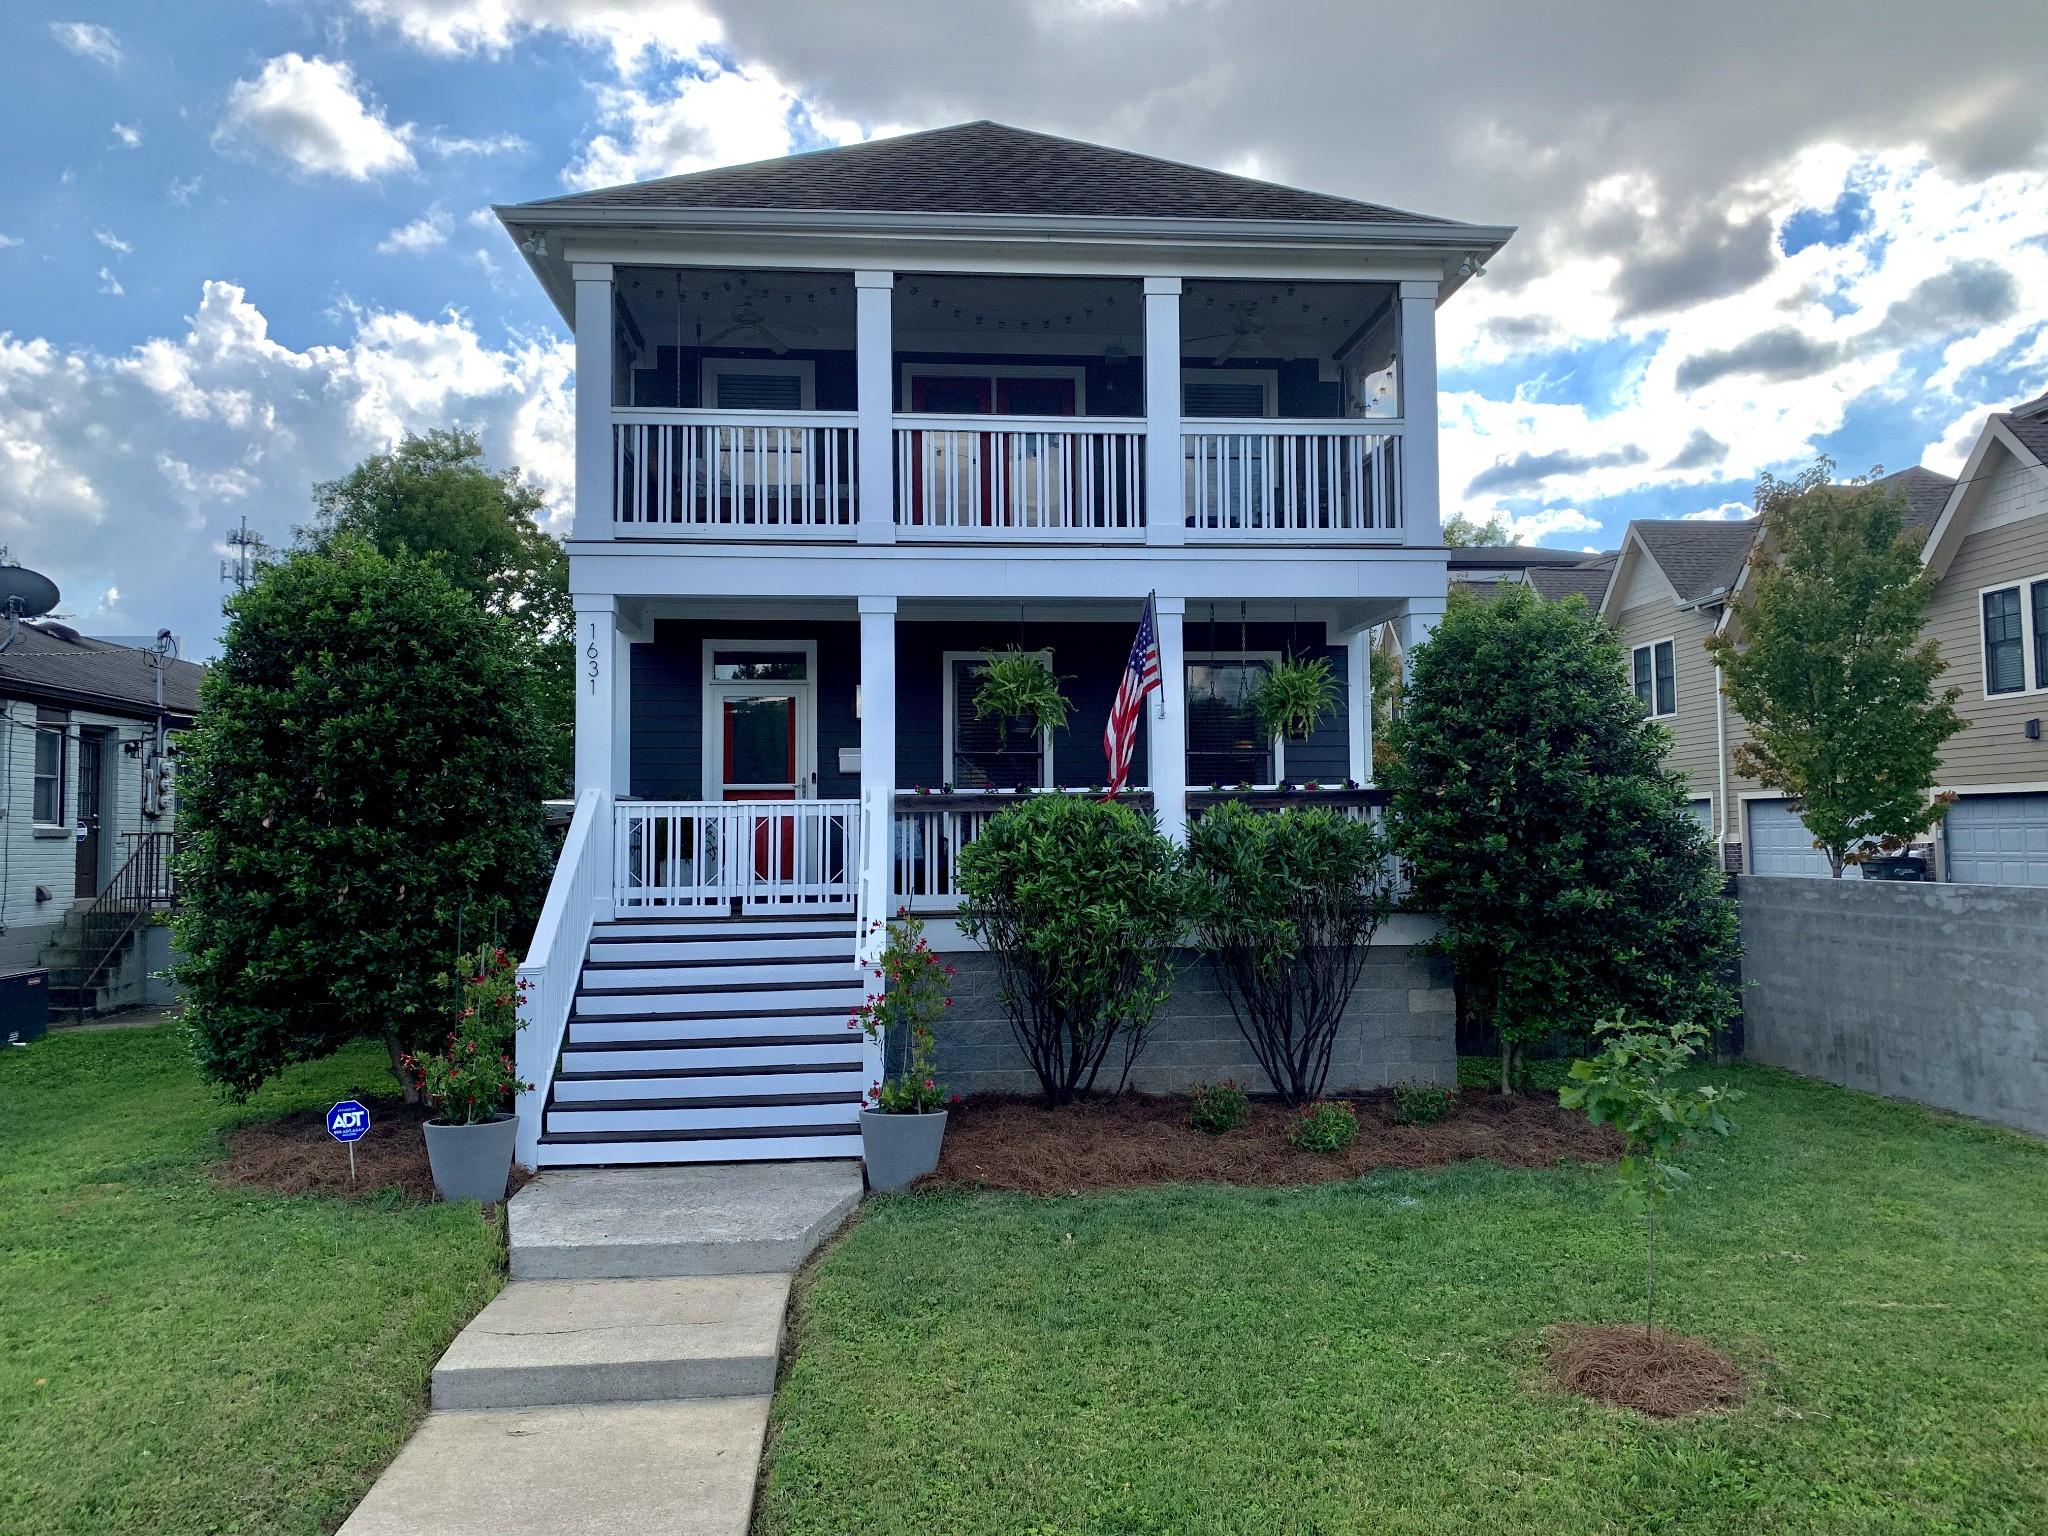 1631 6th Ave N Property Photo - Nashville, TN real estate listing